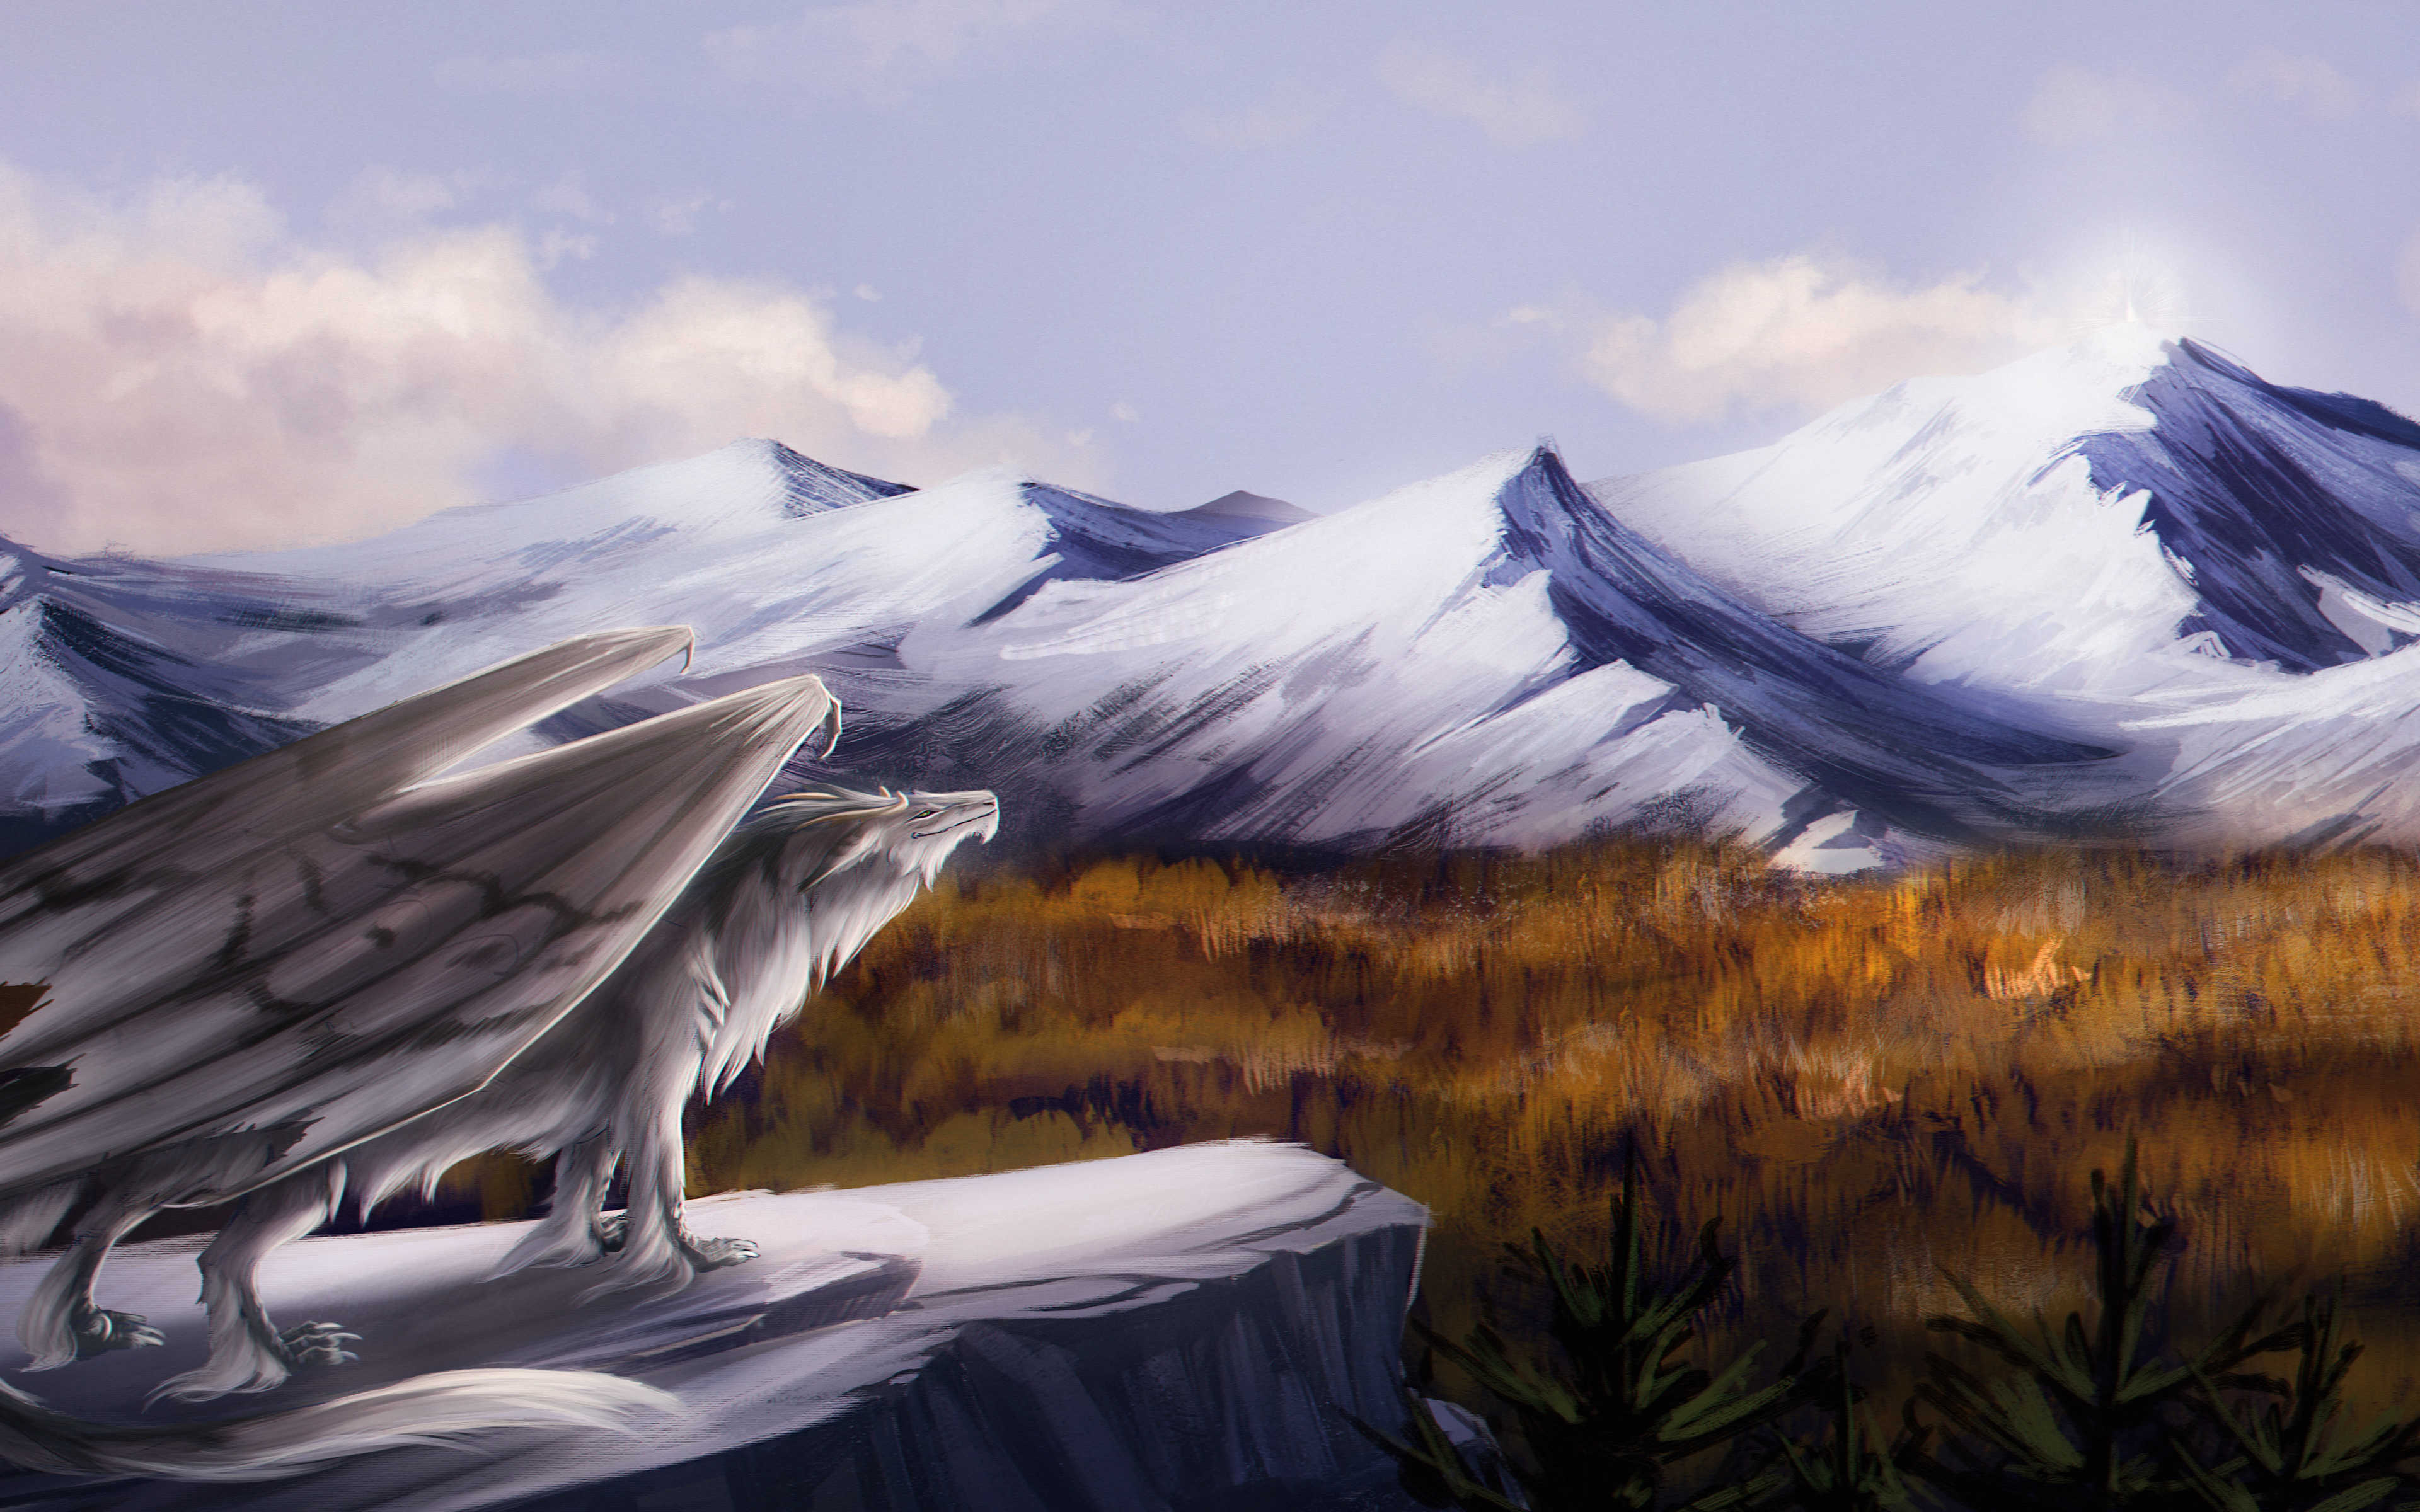 Beautiful Wallpaper Mountain Art - dragon-feral-landscape-fantasy-mountain-art-5k-pv-3840x2400  You Should Have_369344.jpg